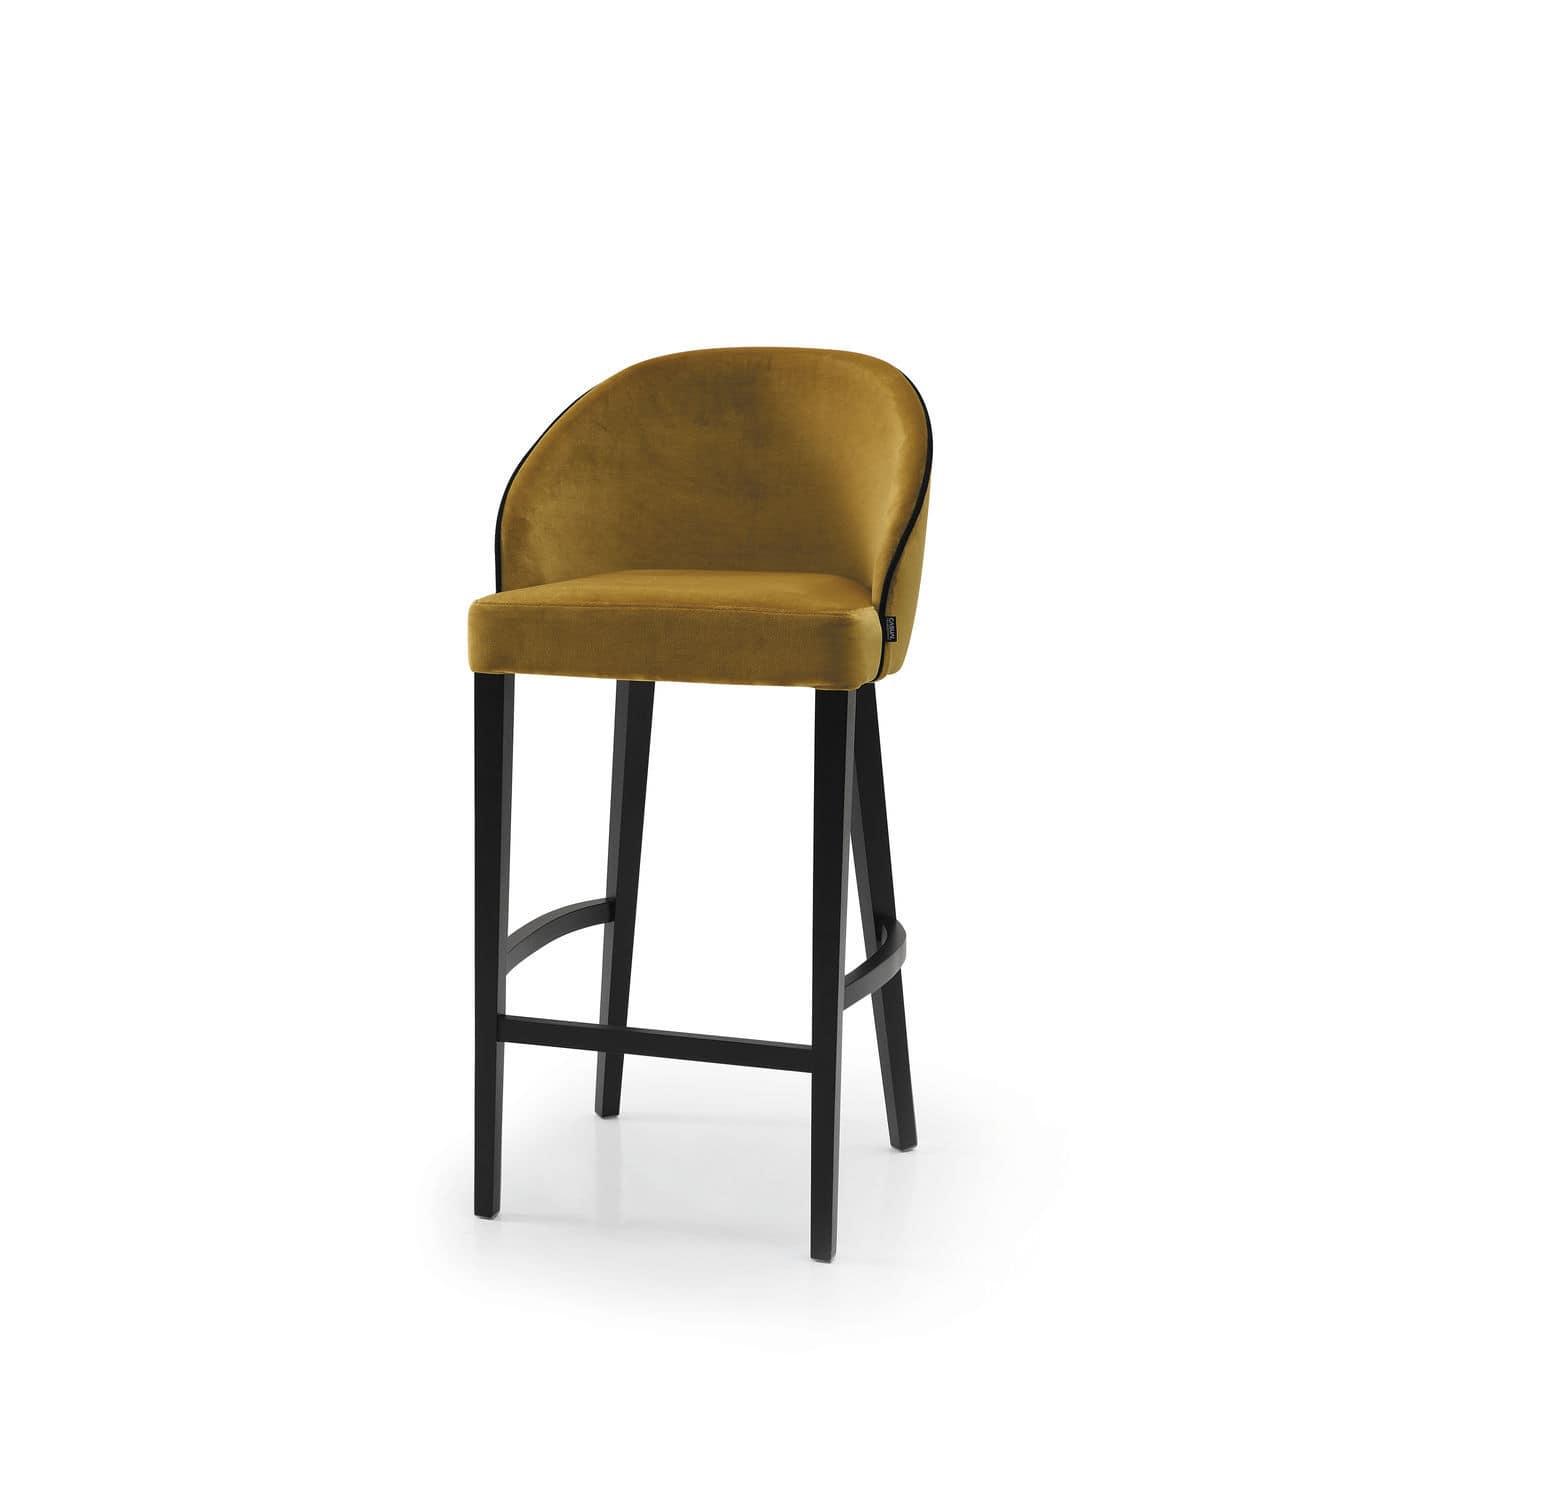 Wondrous Contemporary Bar Stool Fabric Beech Contract Maya Evergreenethics Interior Chair Design Evergreenethicsorg